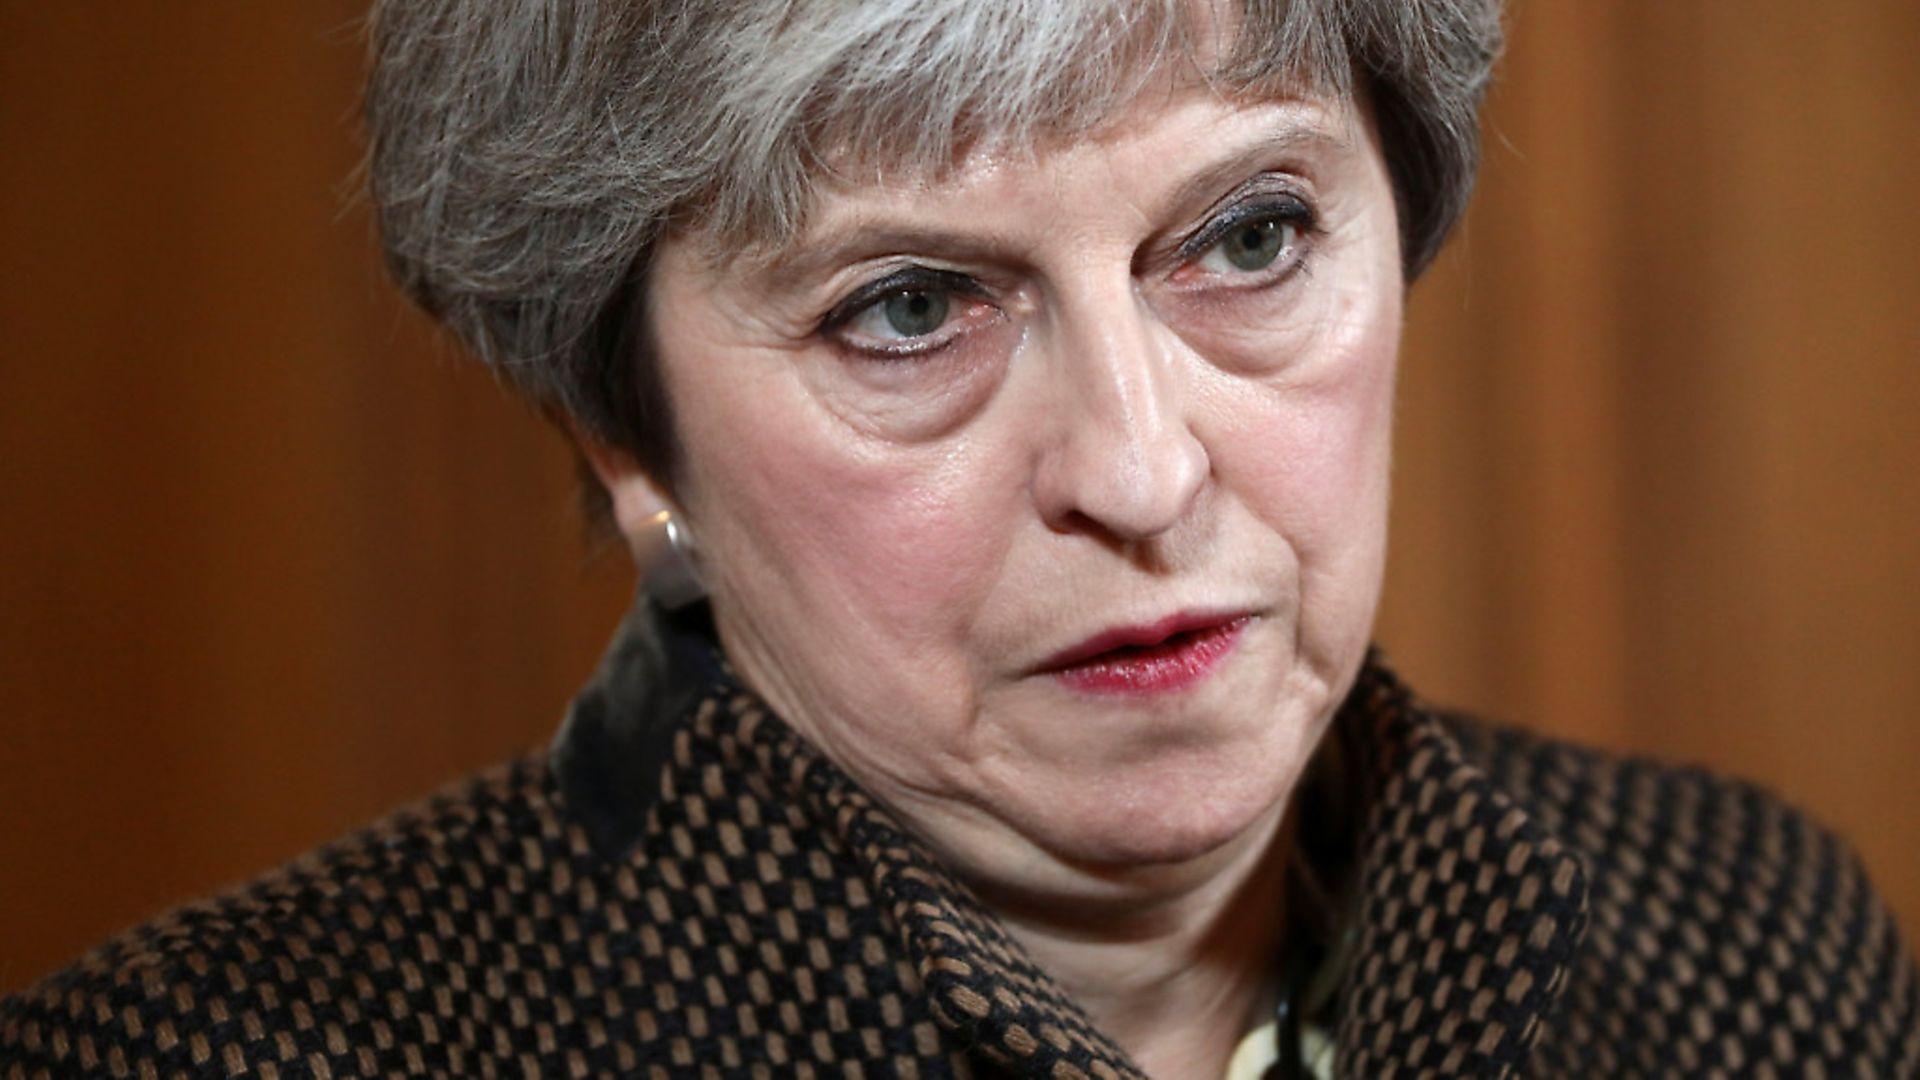 Prime Minister Theresa May. Photograph: PA/Simon Dawson - Credit: PA Wire/PA Images